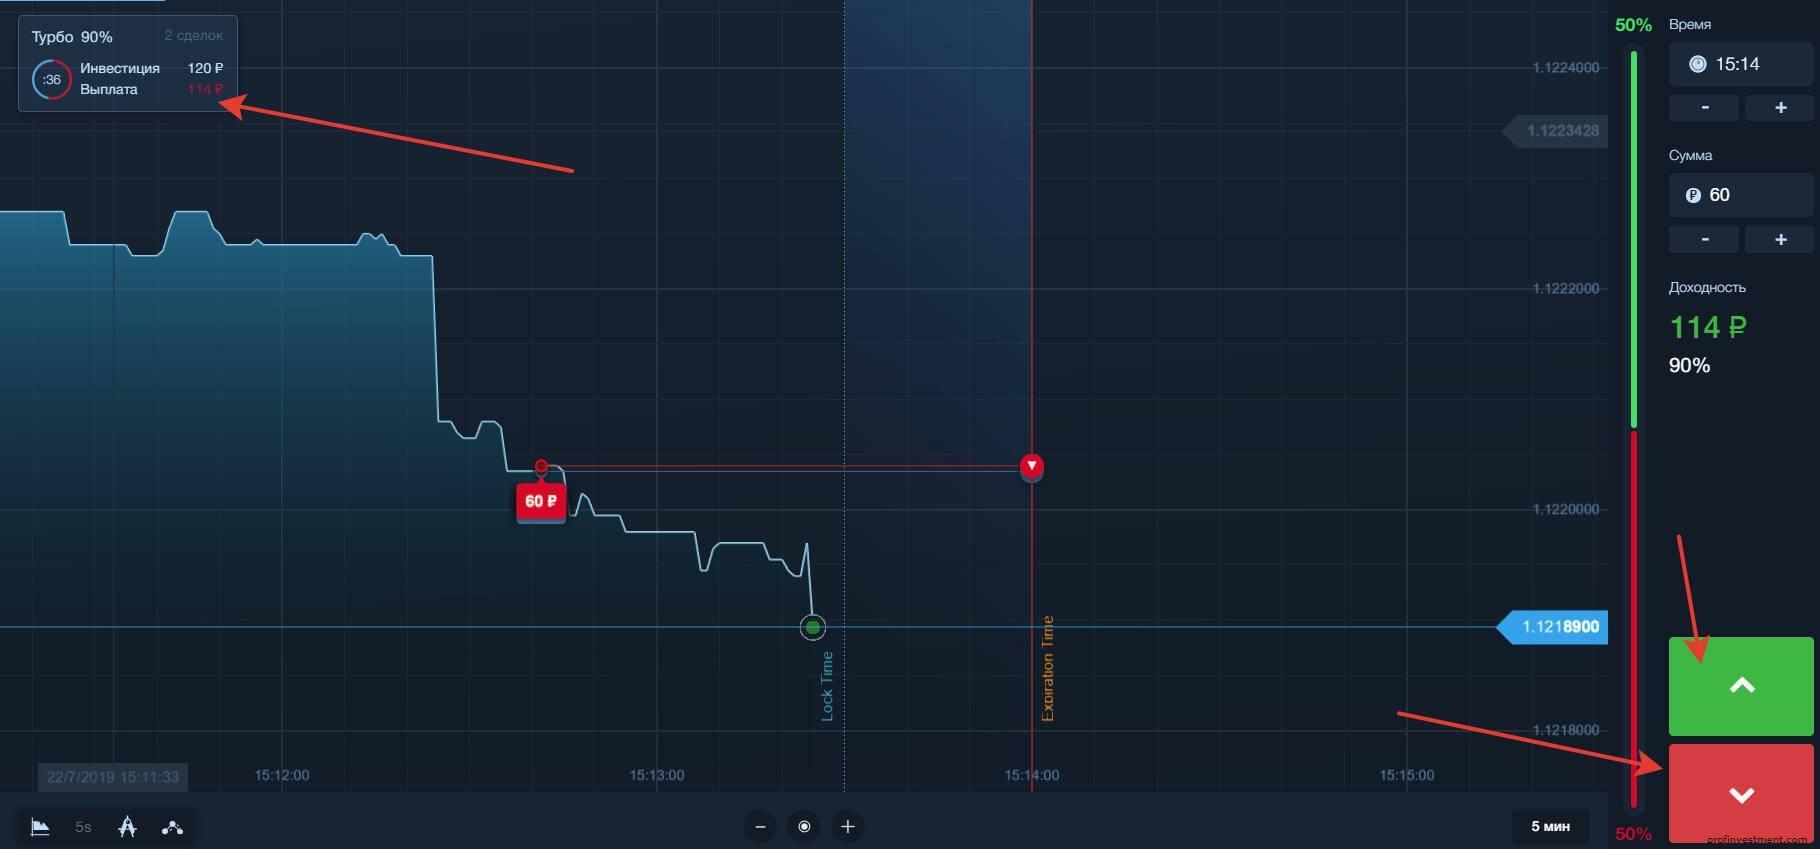 Binarium-personal-experience-trading-binary-option.jpg